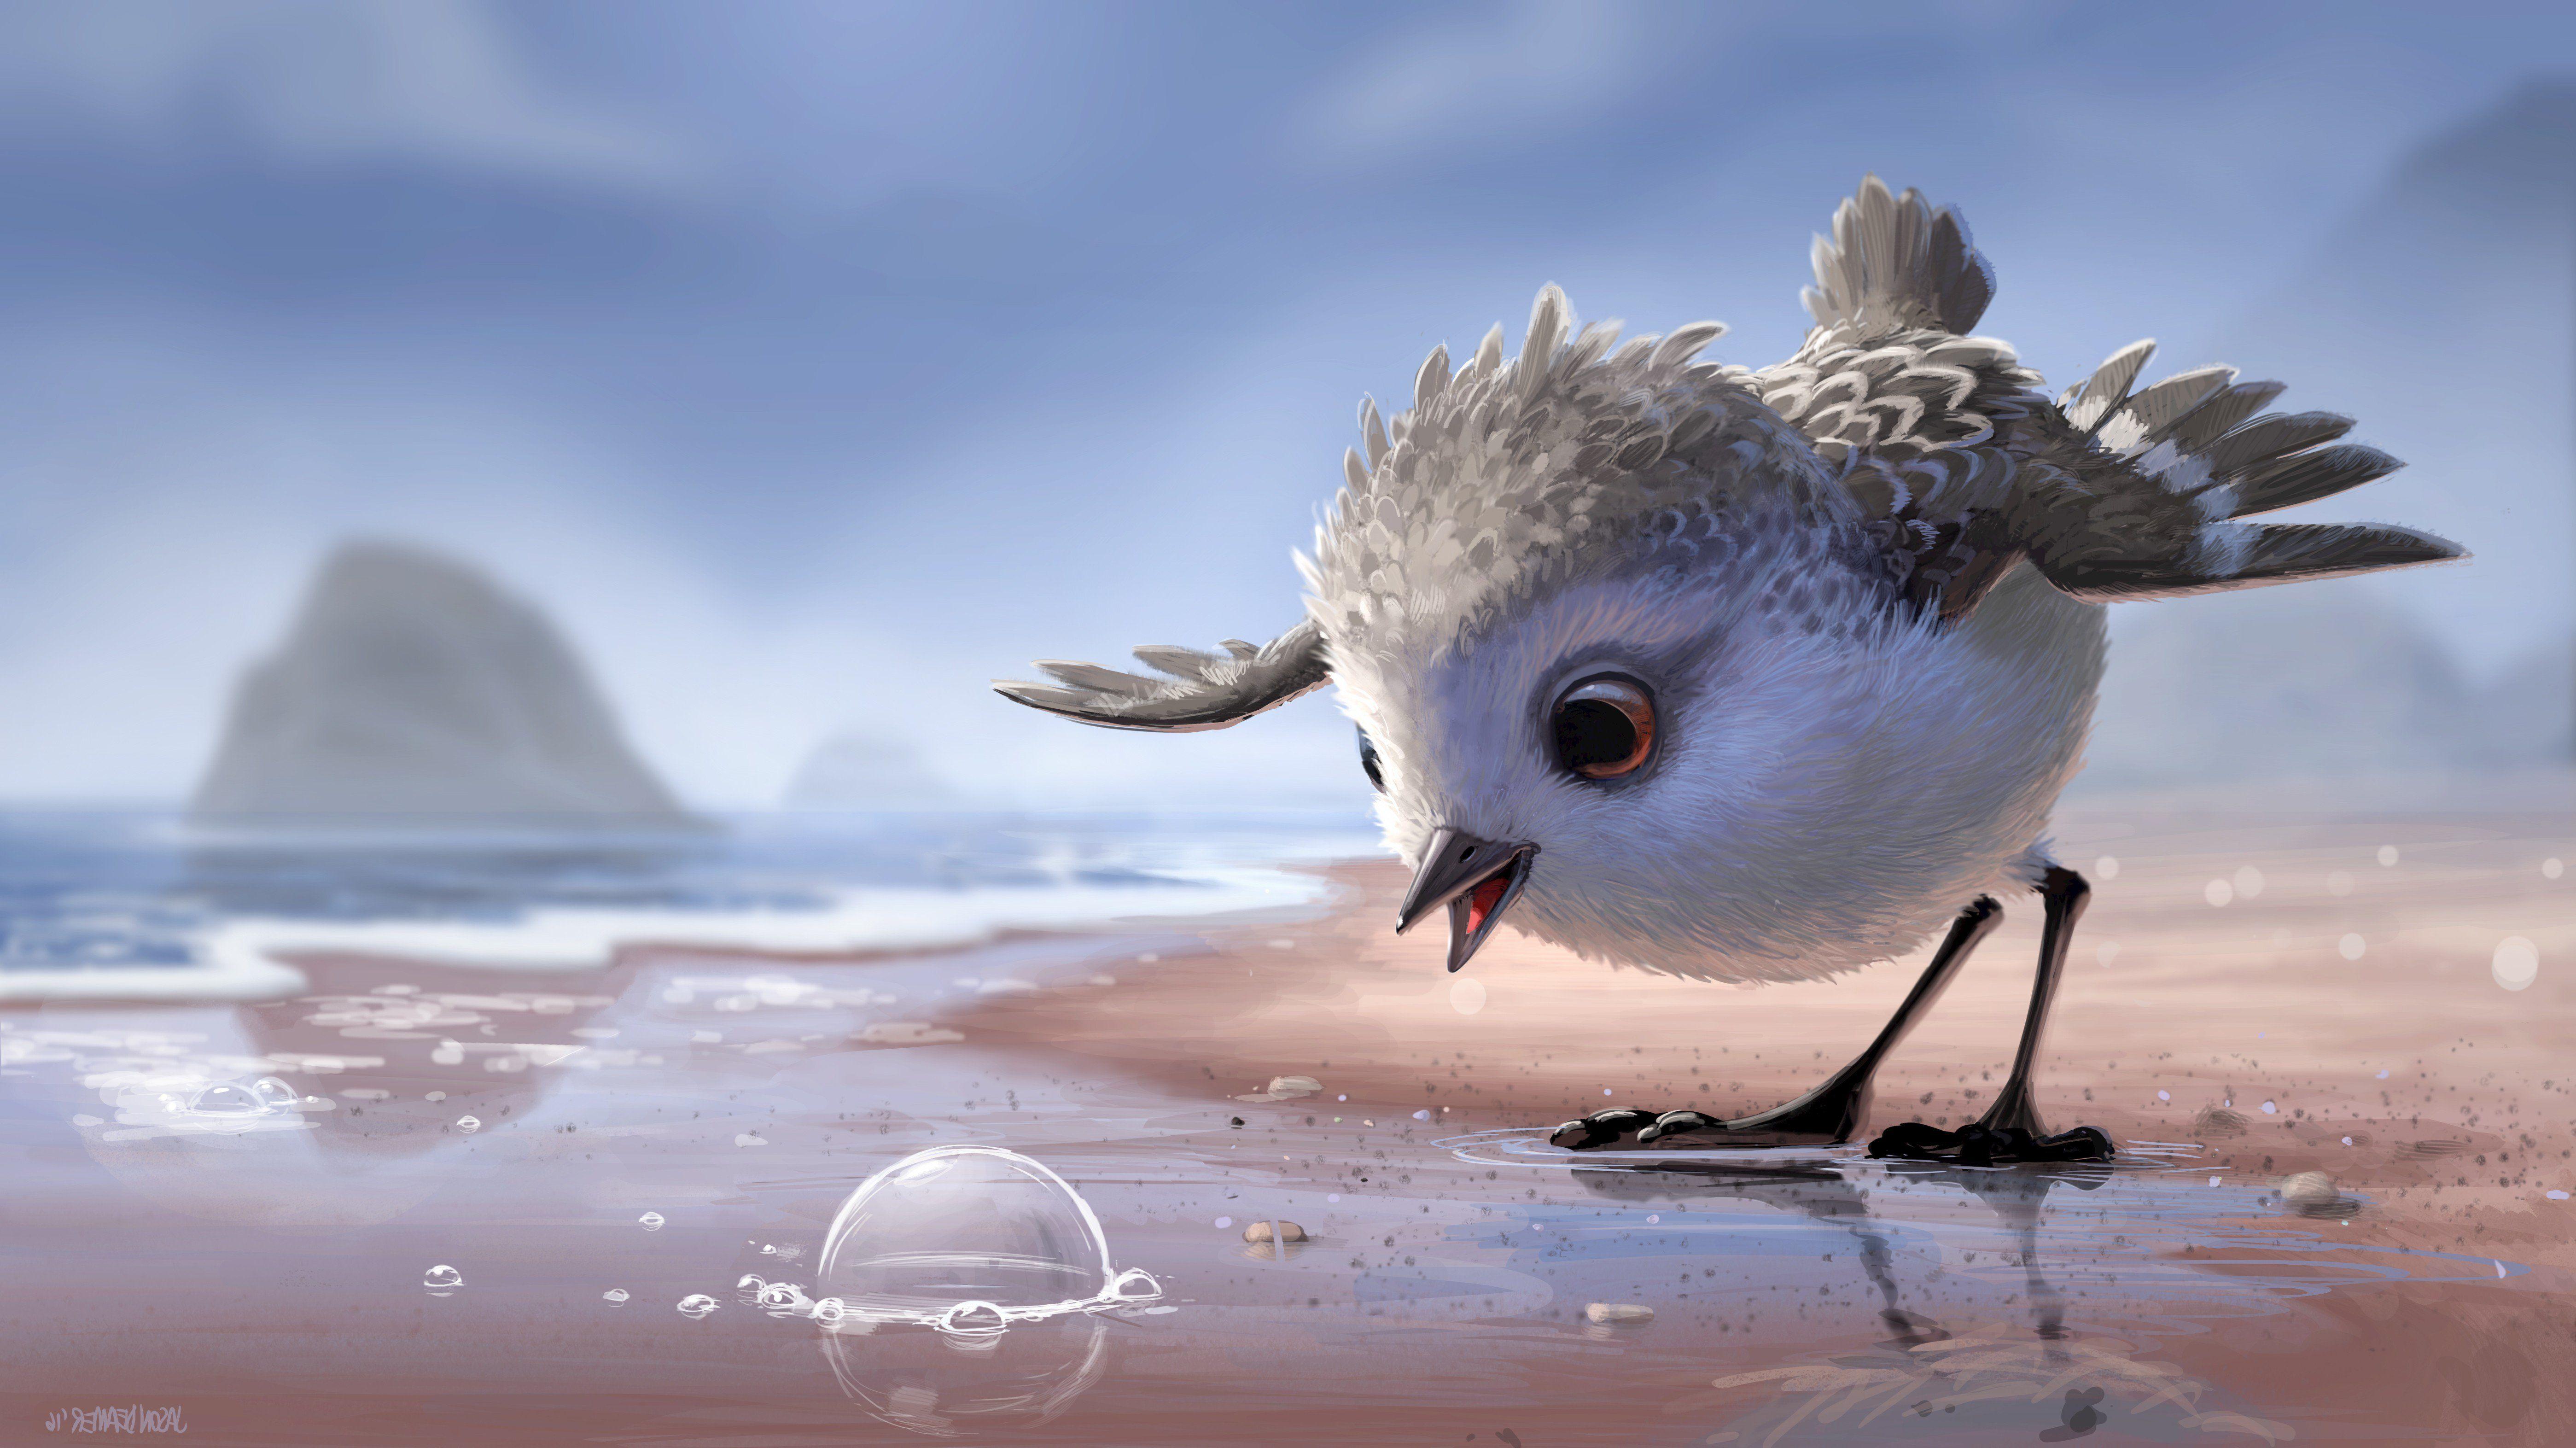 Piper pixar animated movie 5594 3144 disney for Fond ecran qhd